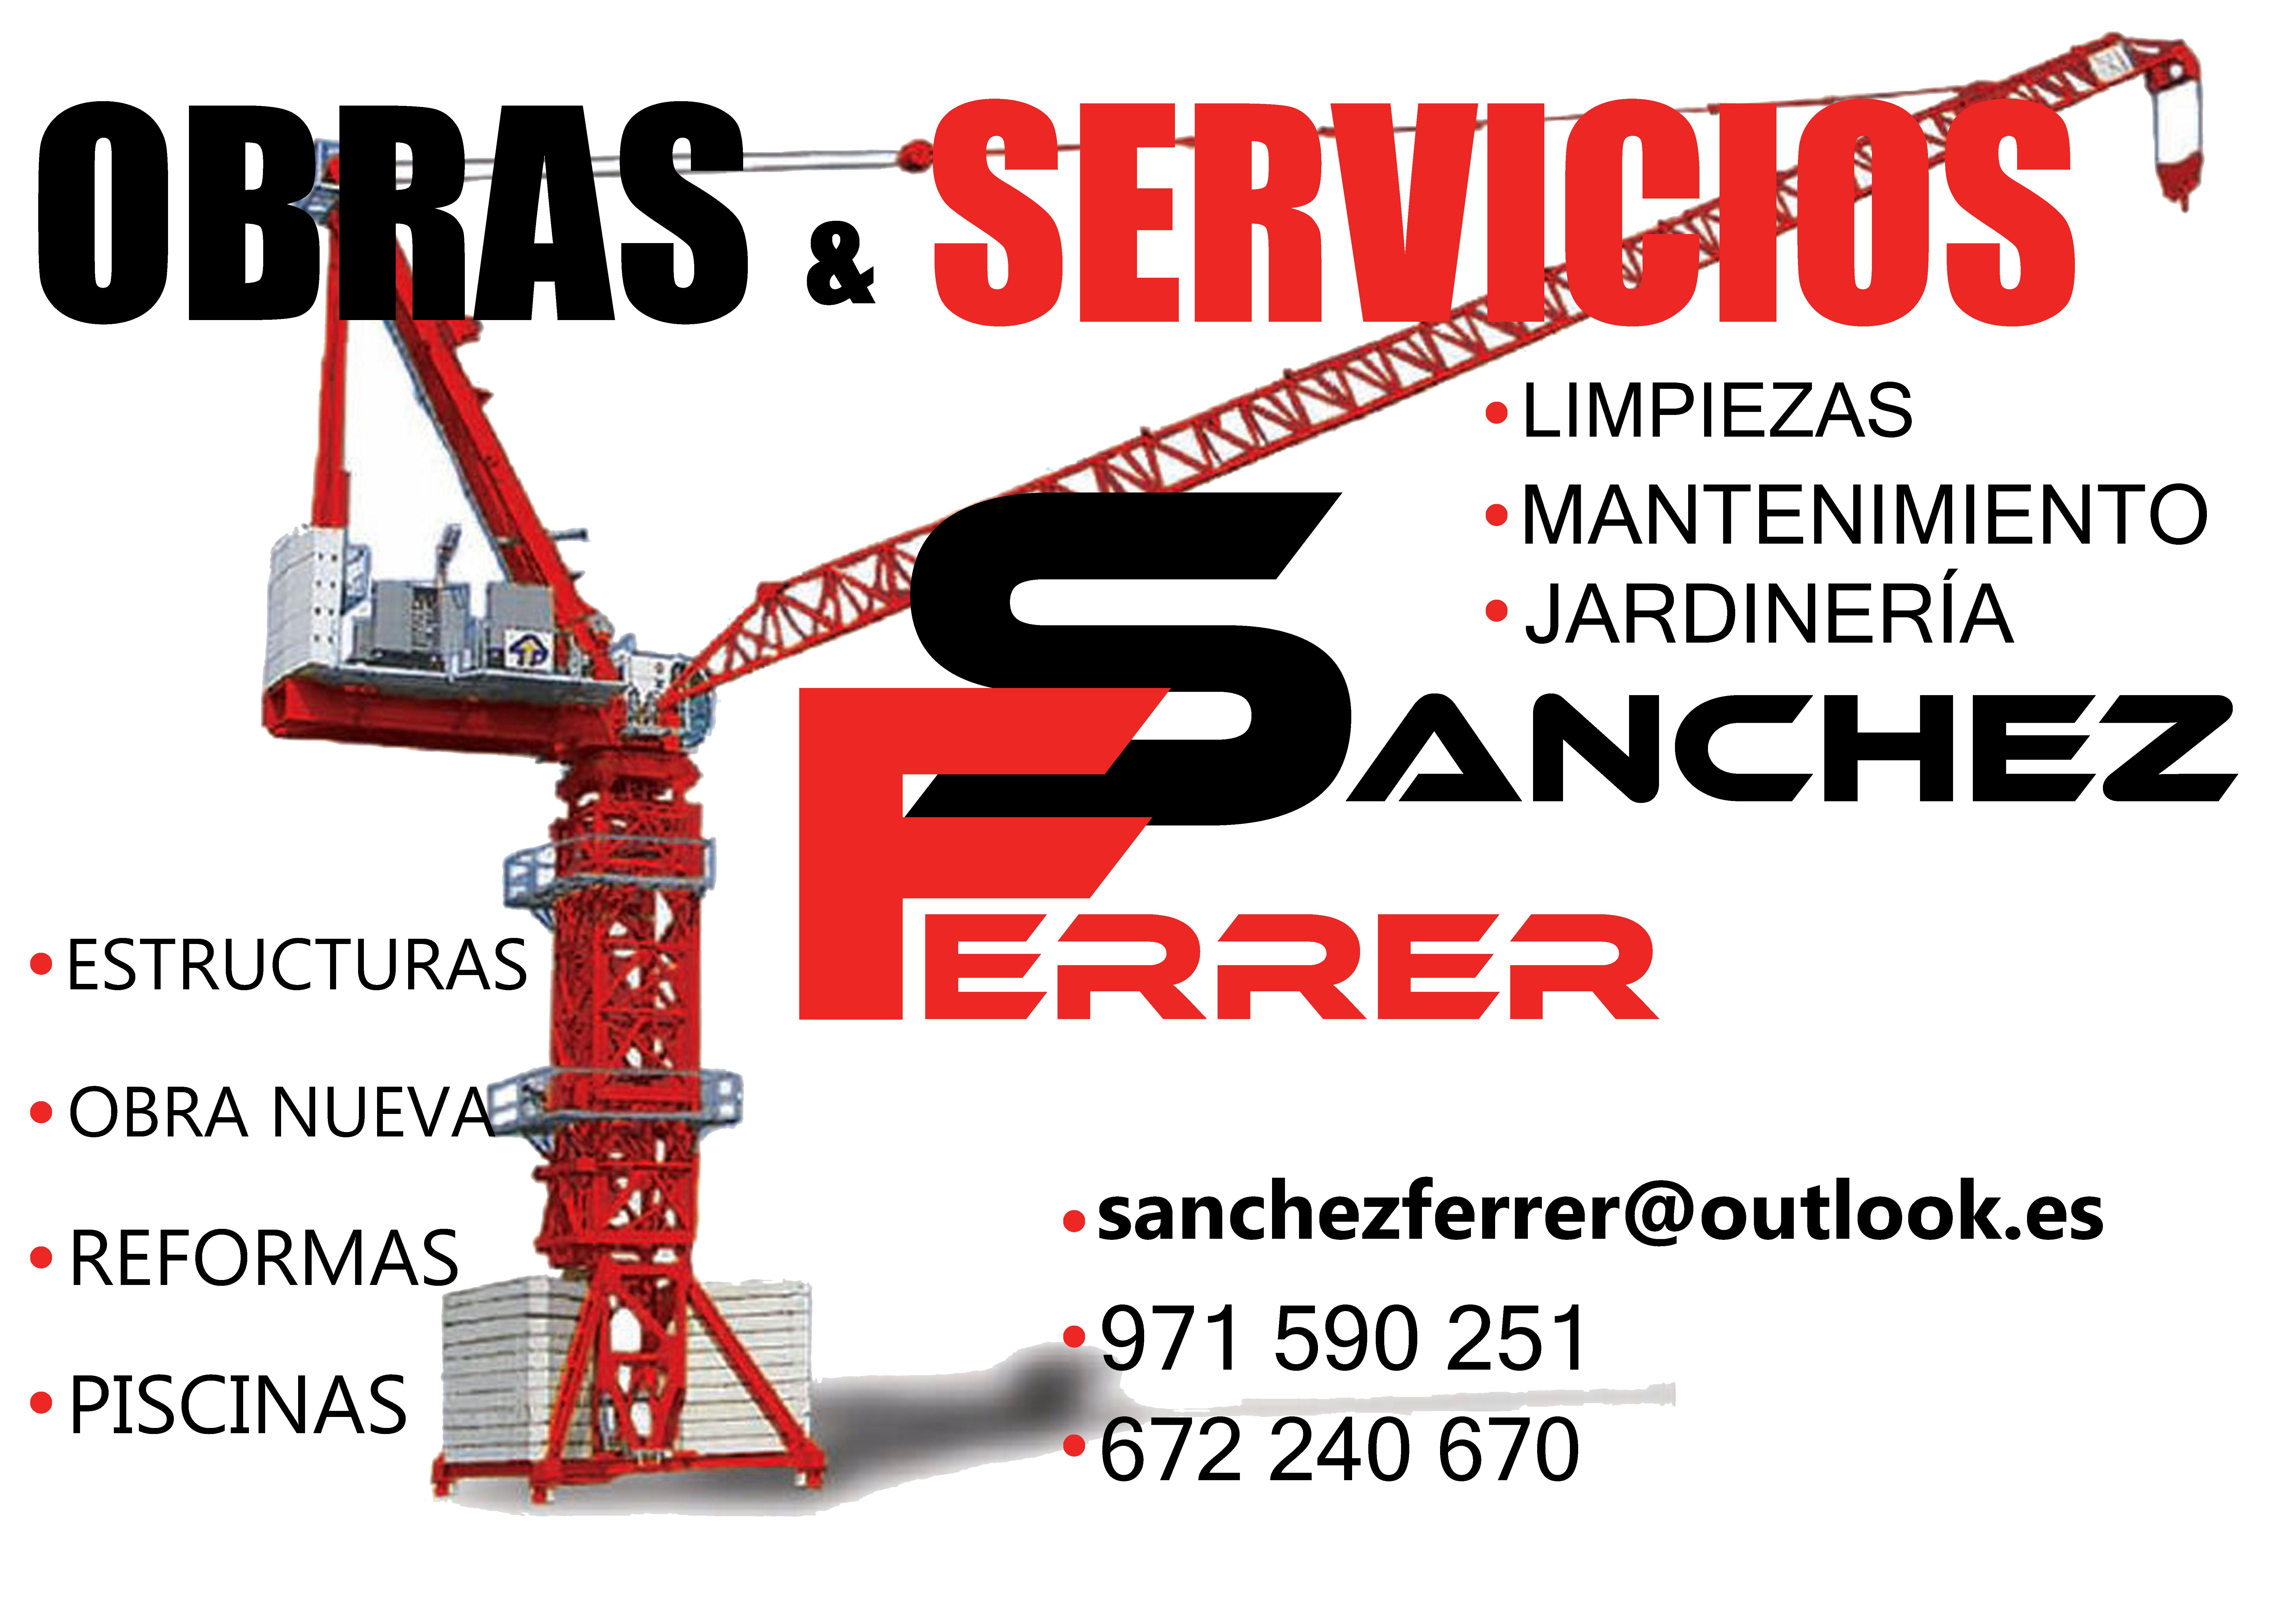 Obras & Servicios Sanchez Ferrer